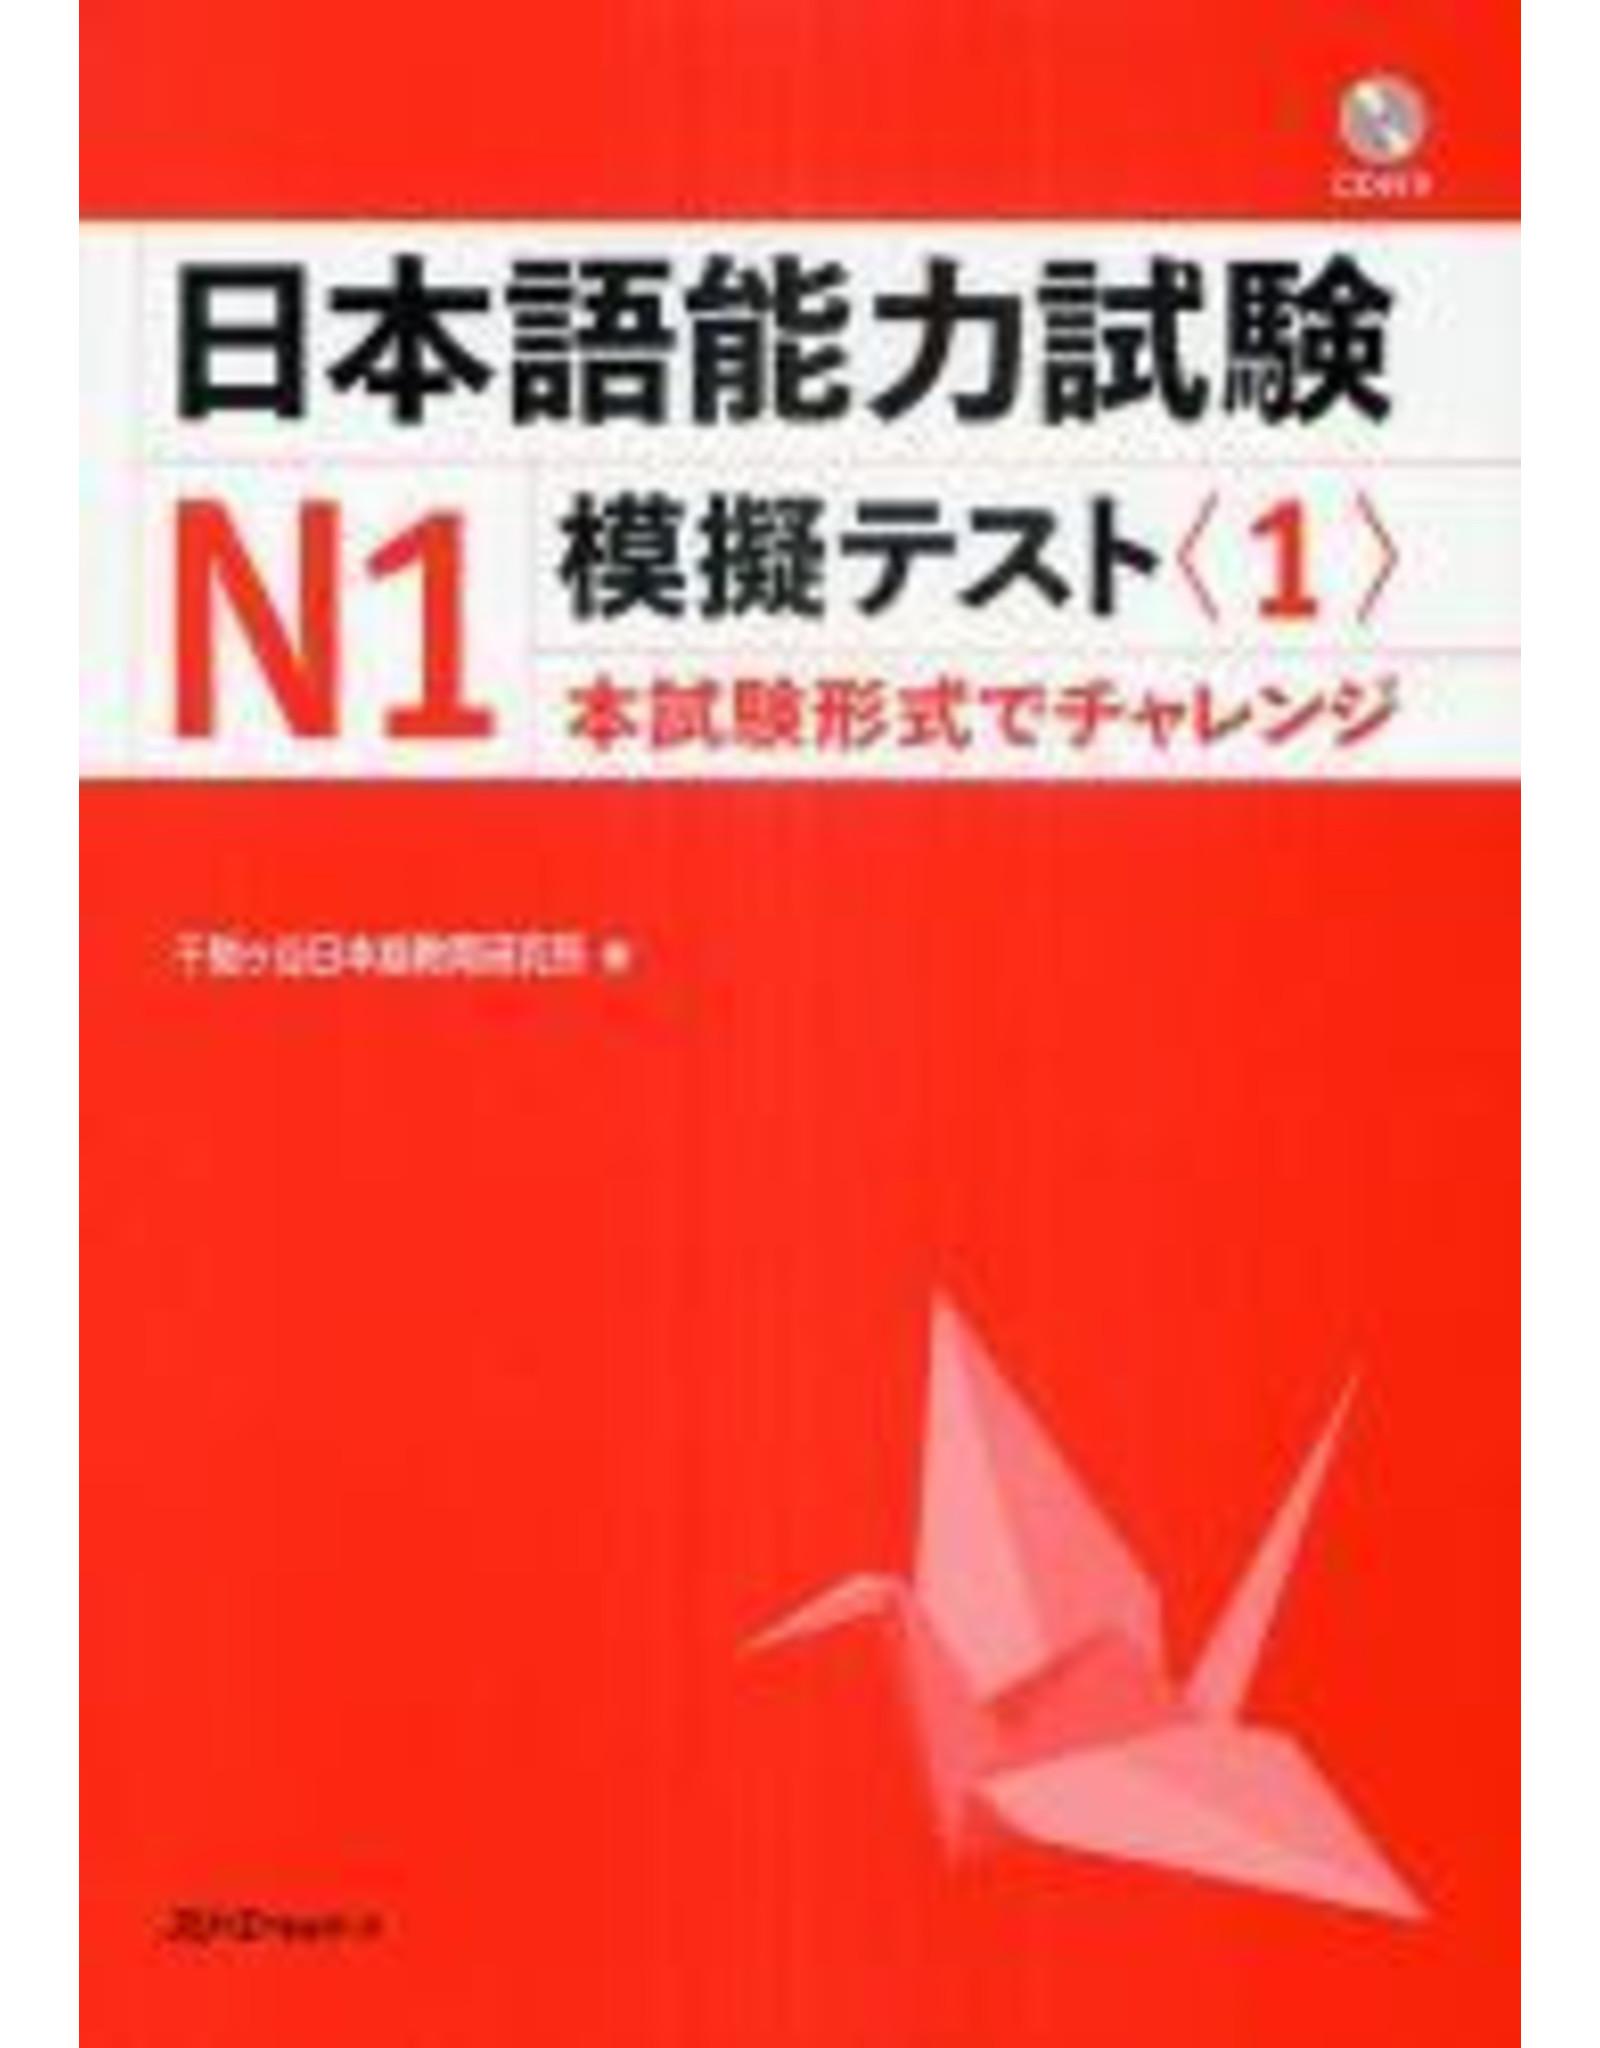 3A Corporation JLPT MOGI TEST N1 (1) W/CD